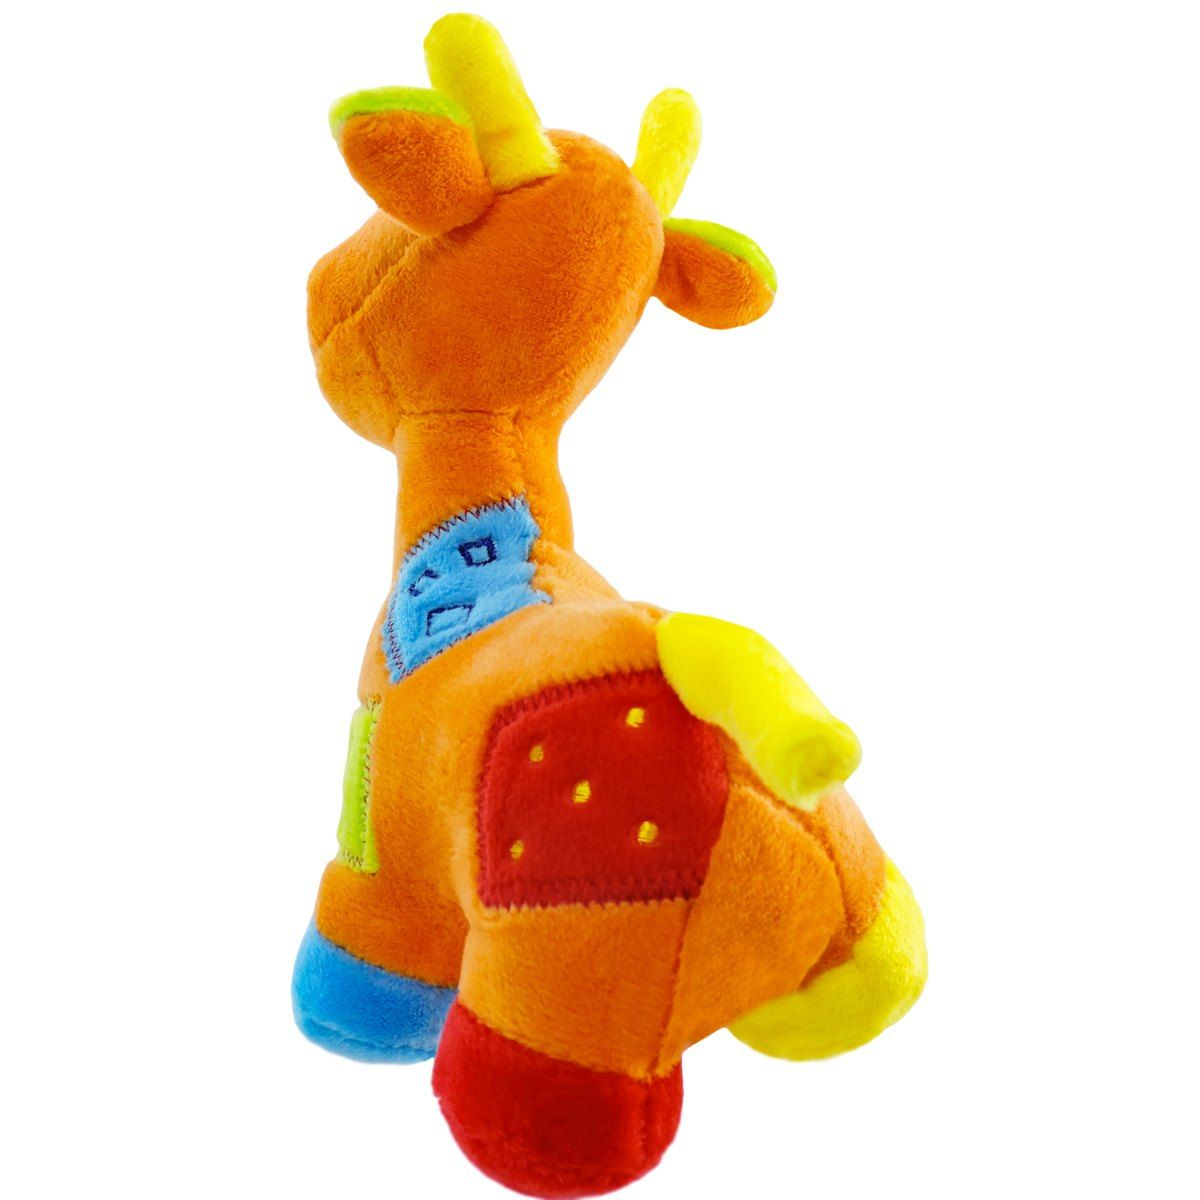 Pelúcia Com Chocalho Infantil Girafa Laranja - Unik Toys